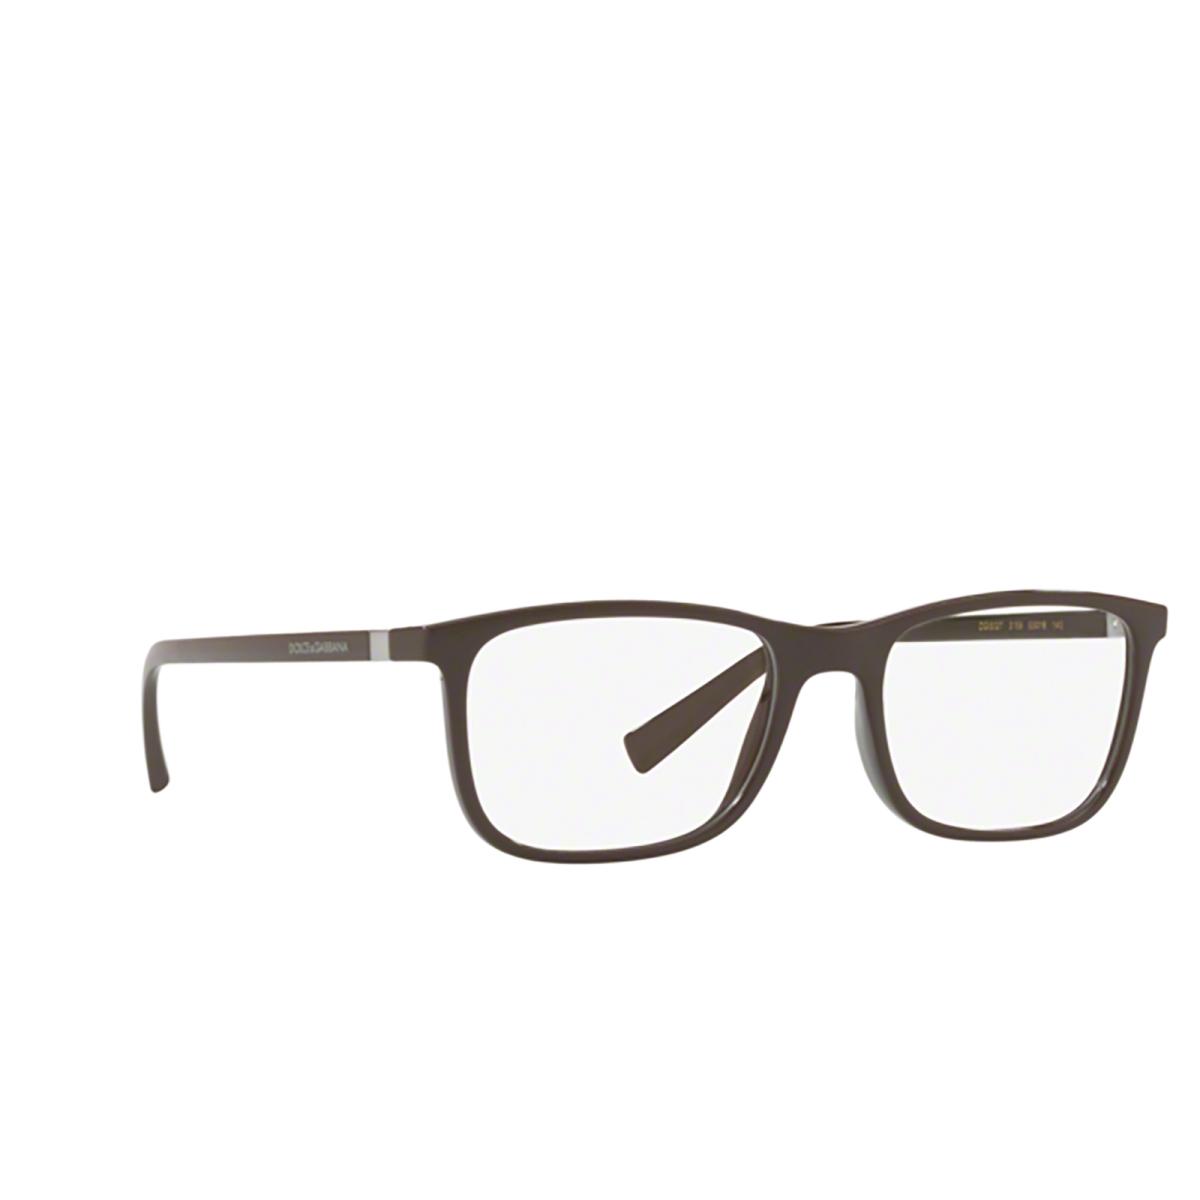 Dolce & Gabbana® Square Eyeglasses: DG5027 color 3159 - three-quarters view.